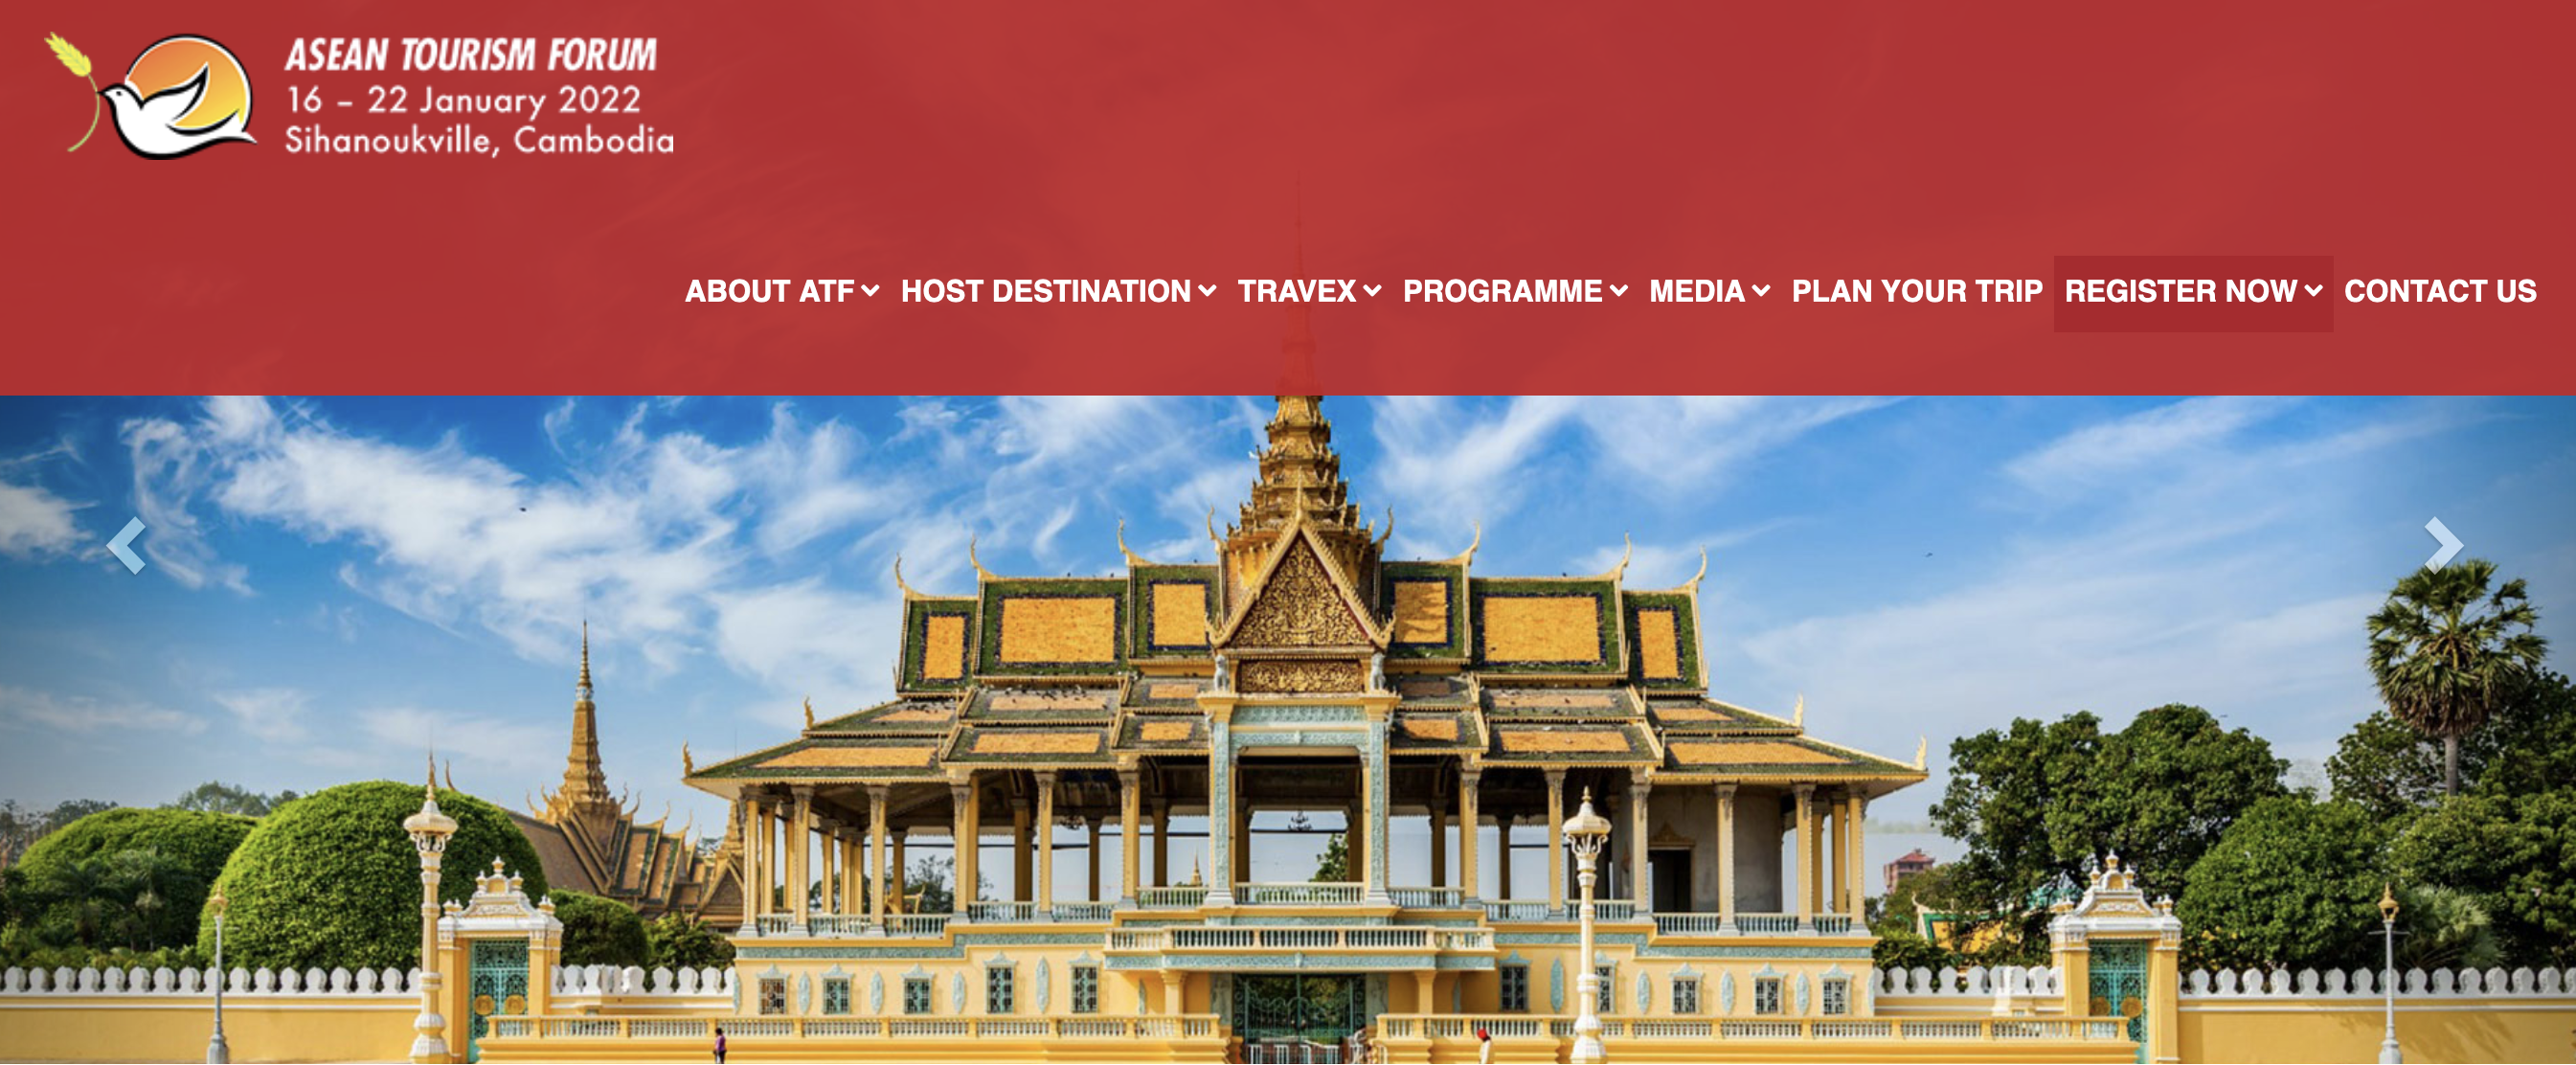 The ASEAN Tourism Forum 2022 - Unravel Travel TV